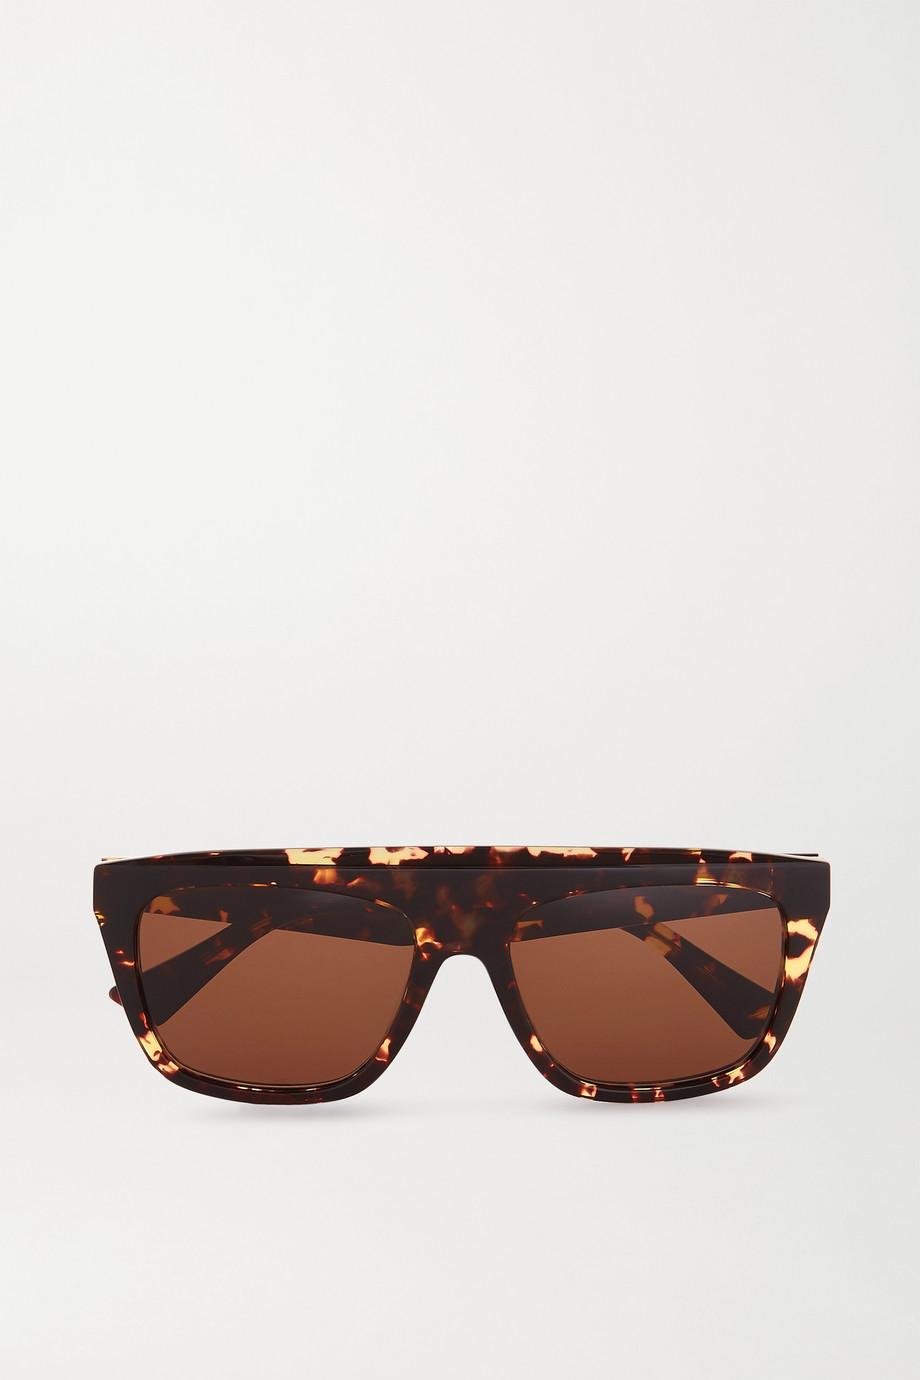 Bottega Veneta D-frame tortoiseshell acetate sunglasses